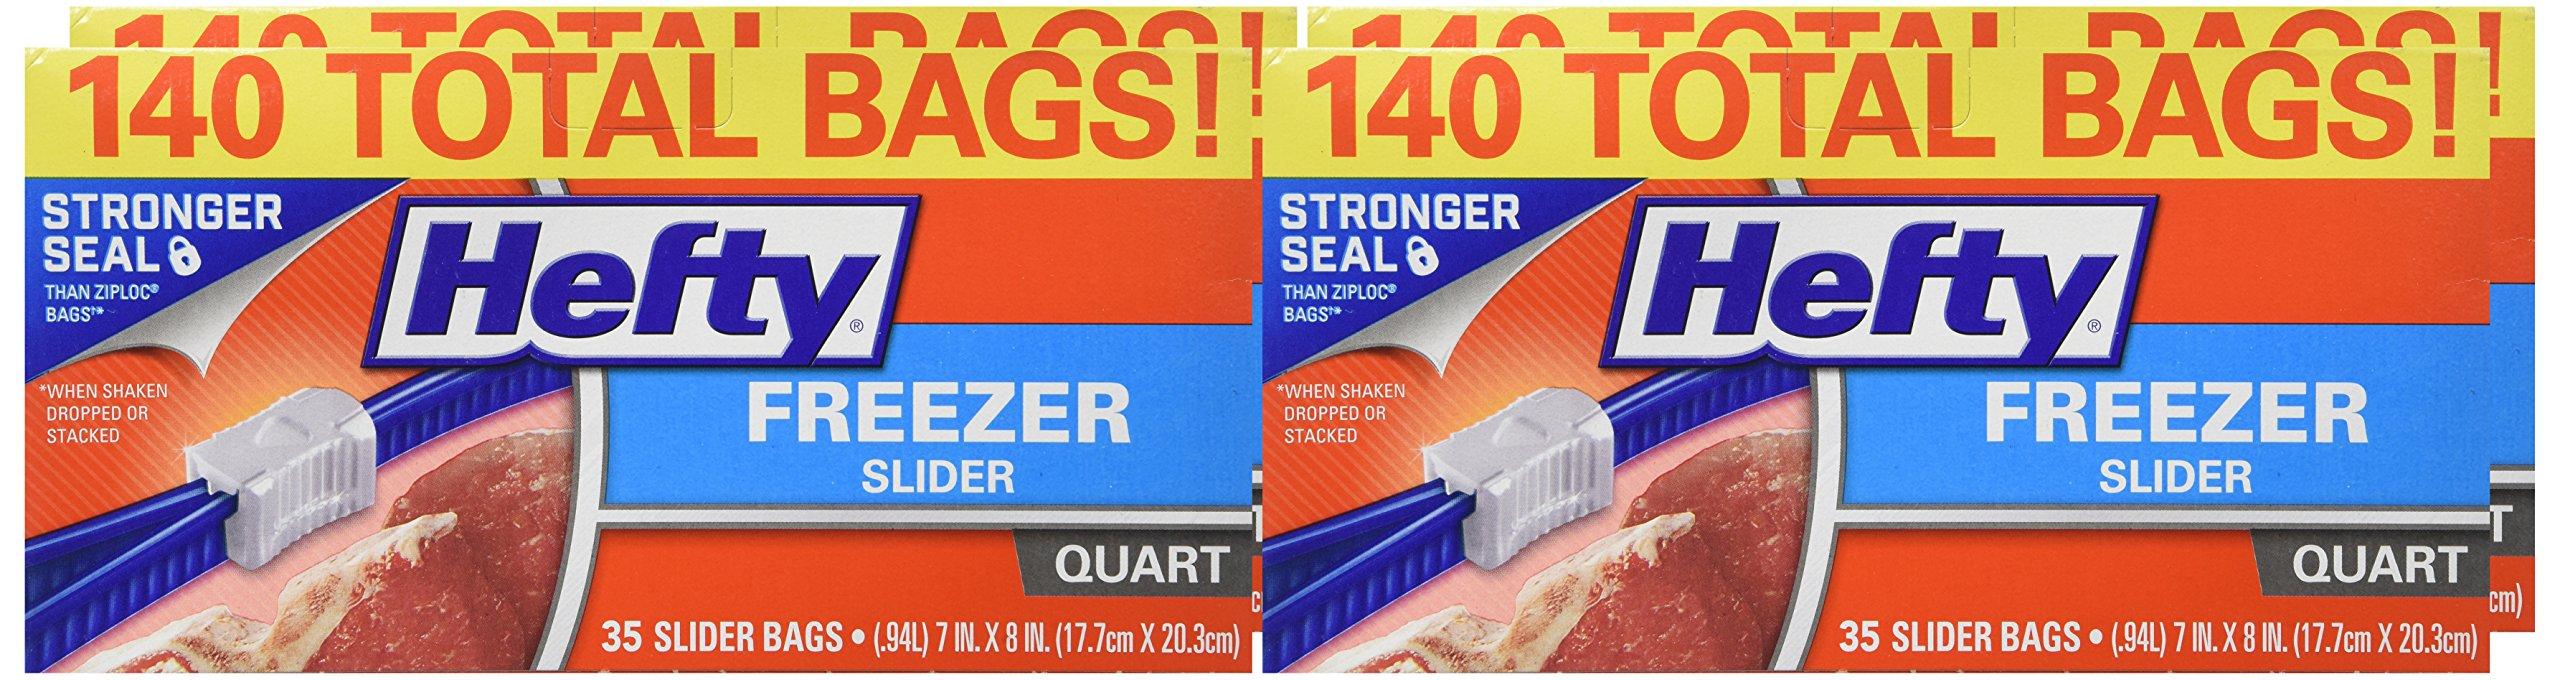 Hefty Slider Freezer Bags - Quart Size, 140 Count